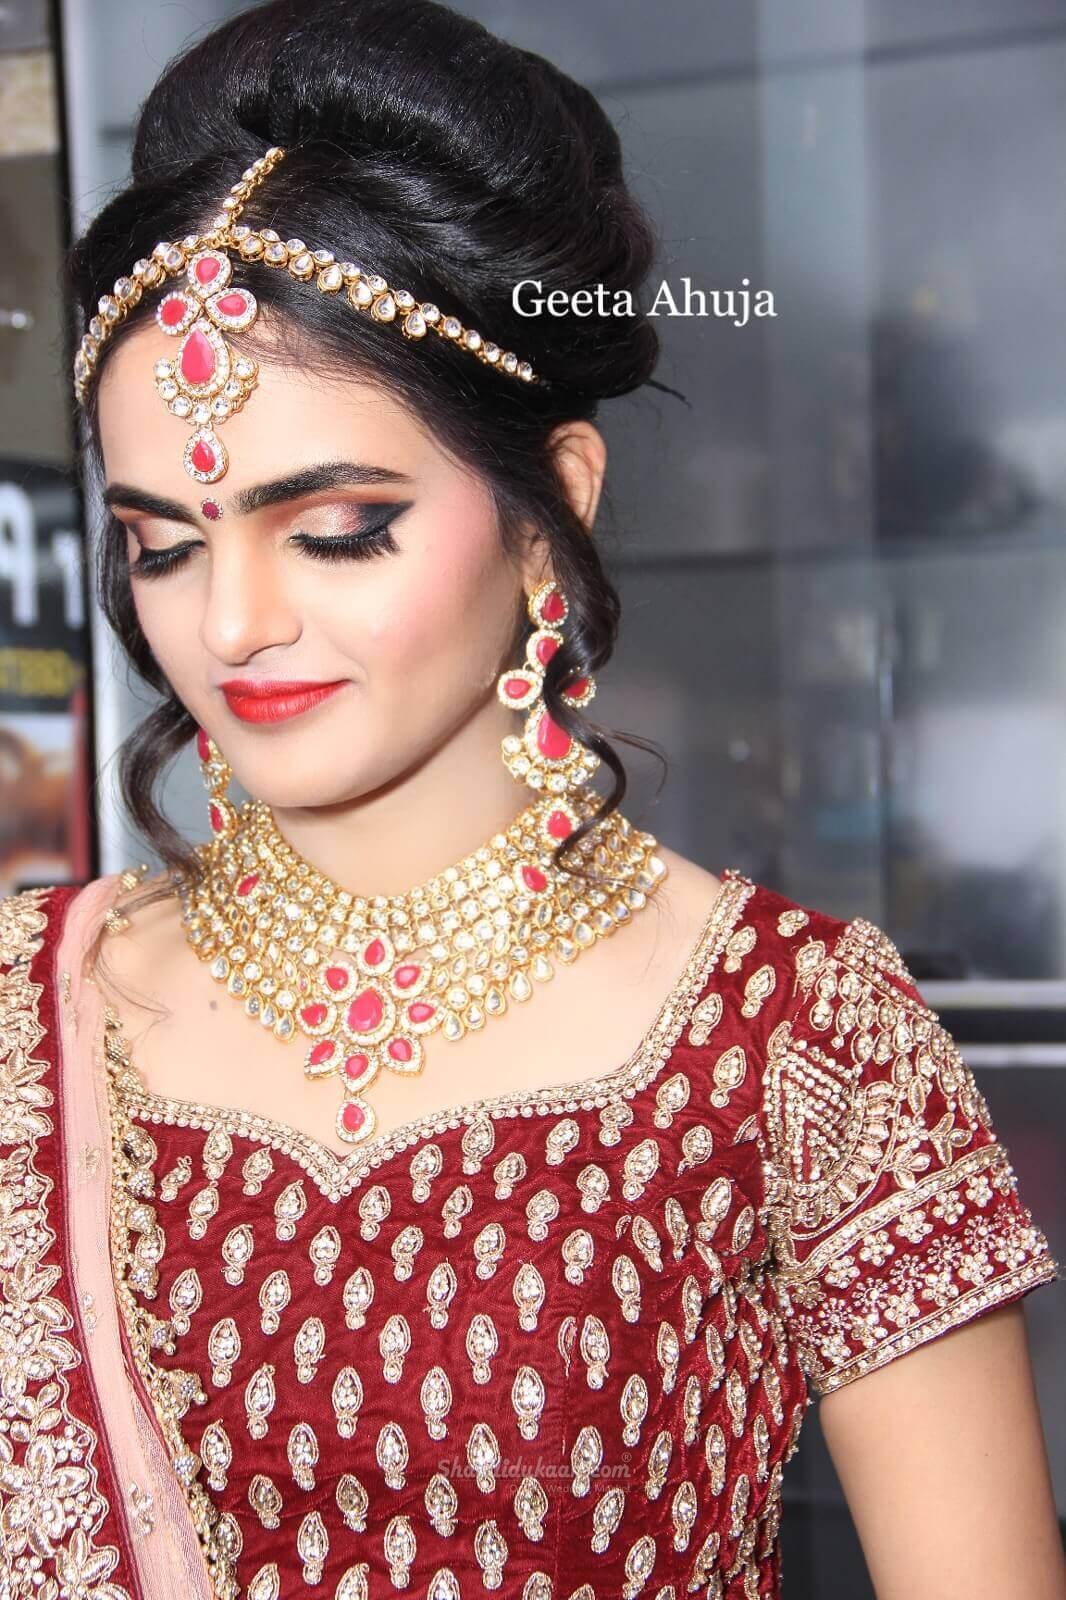 Makeover Plus Bridal Studio by Geeta Ahuja